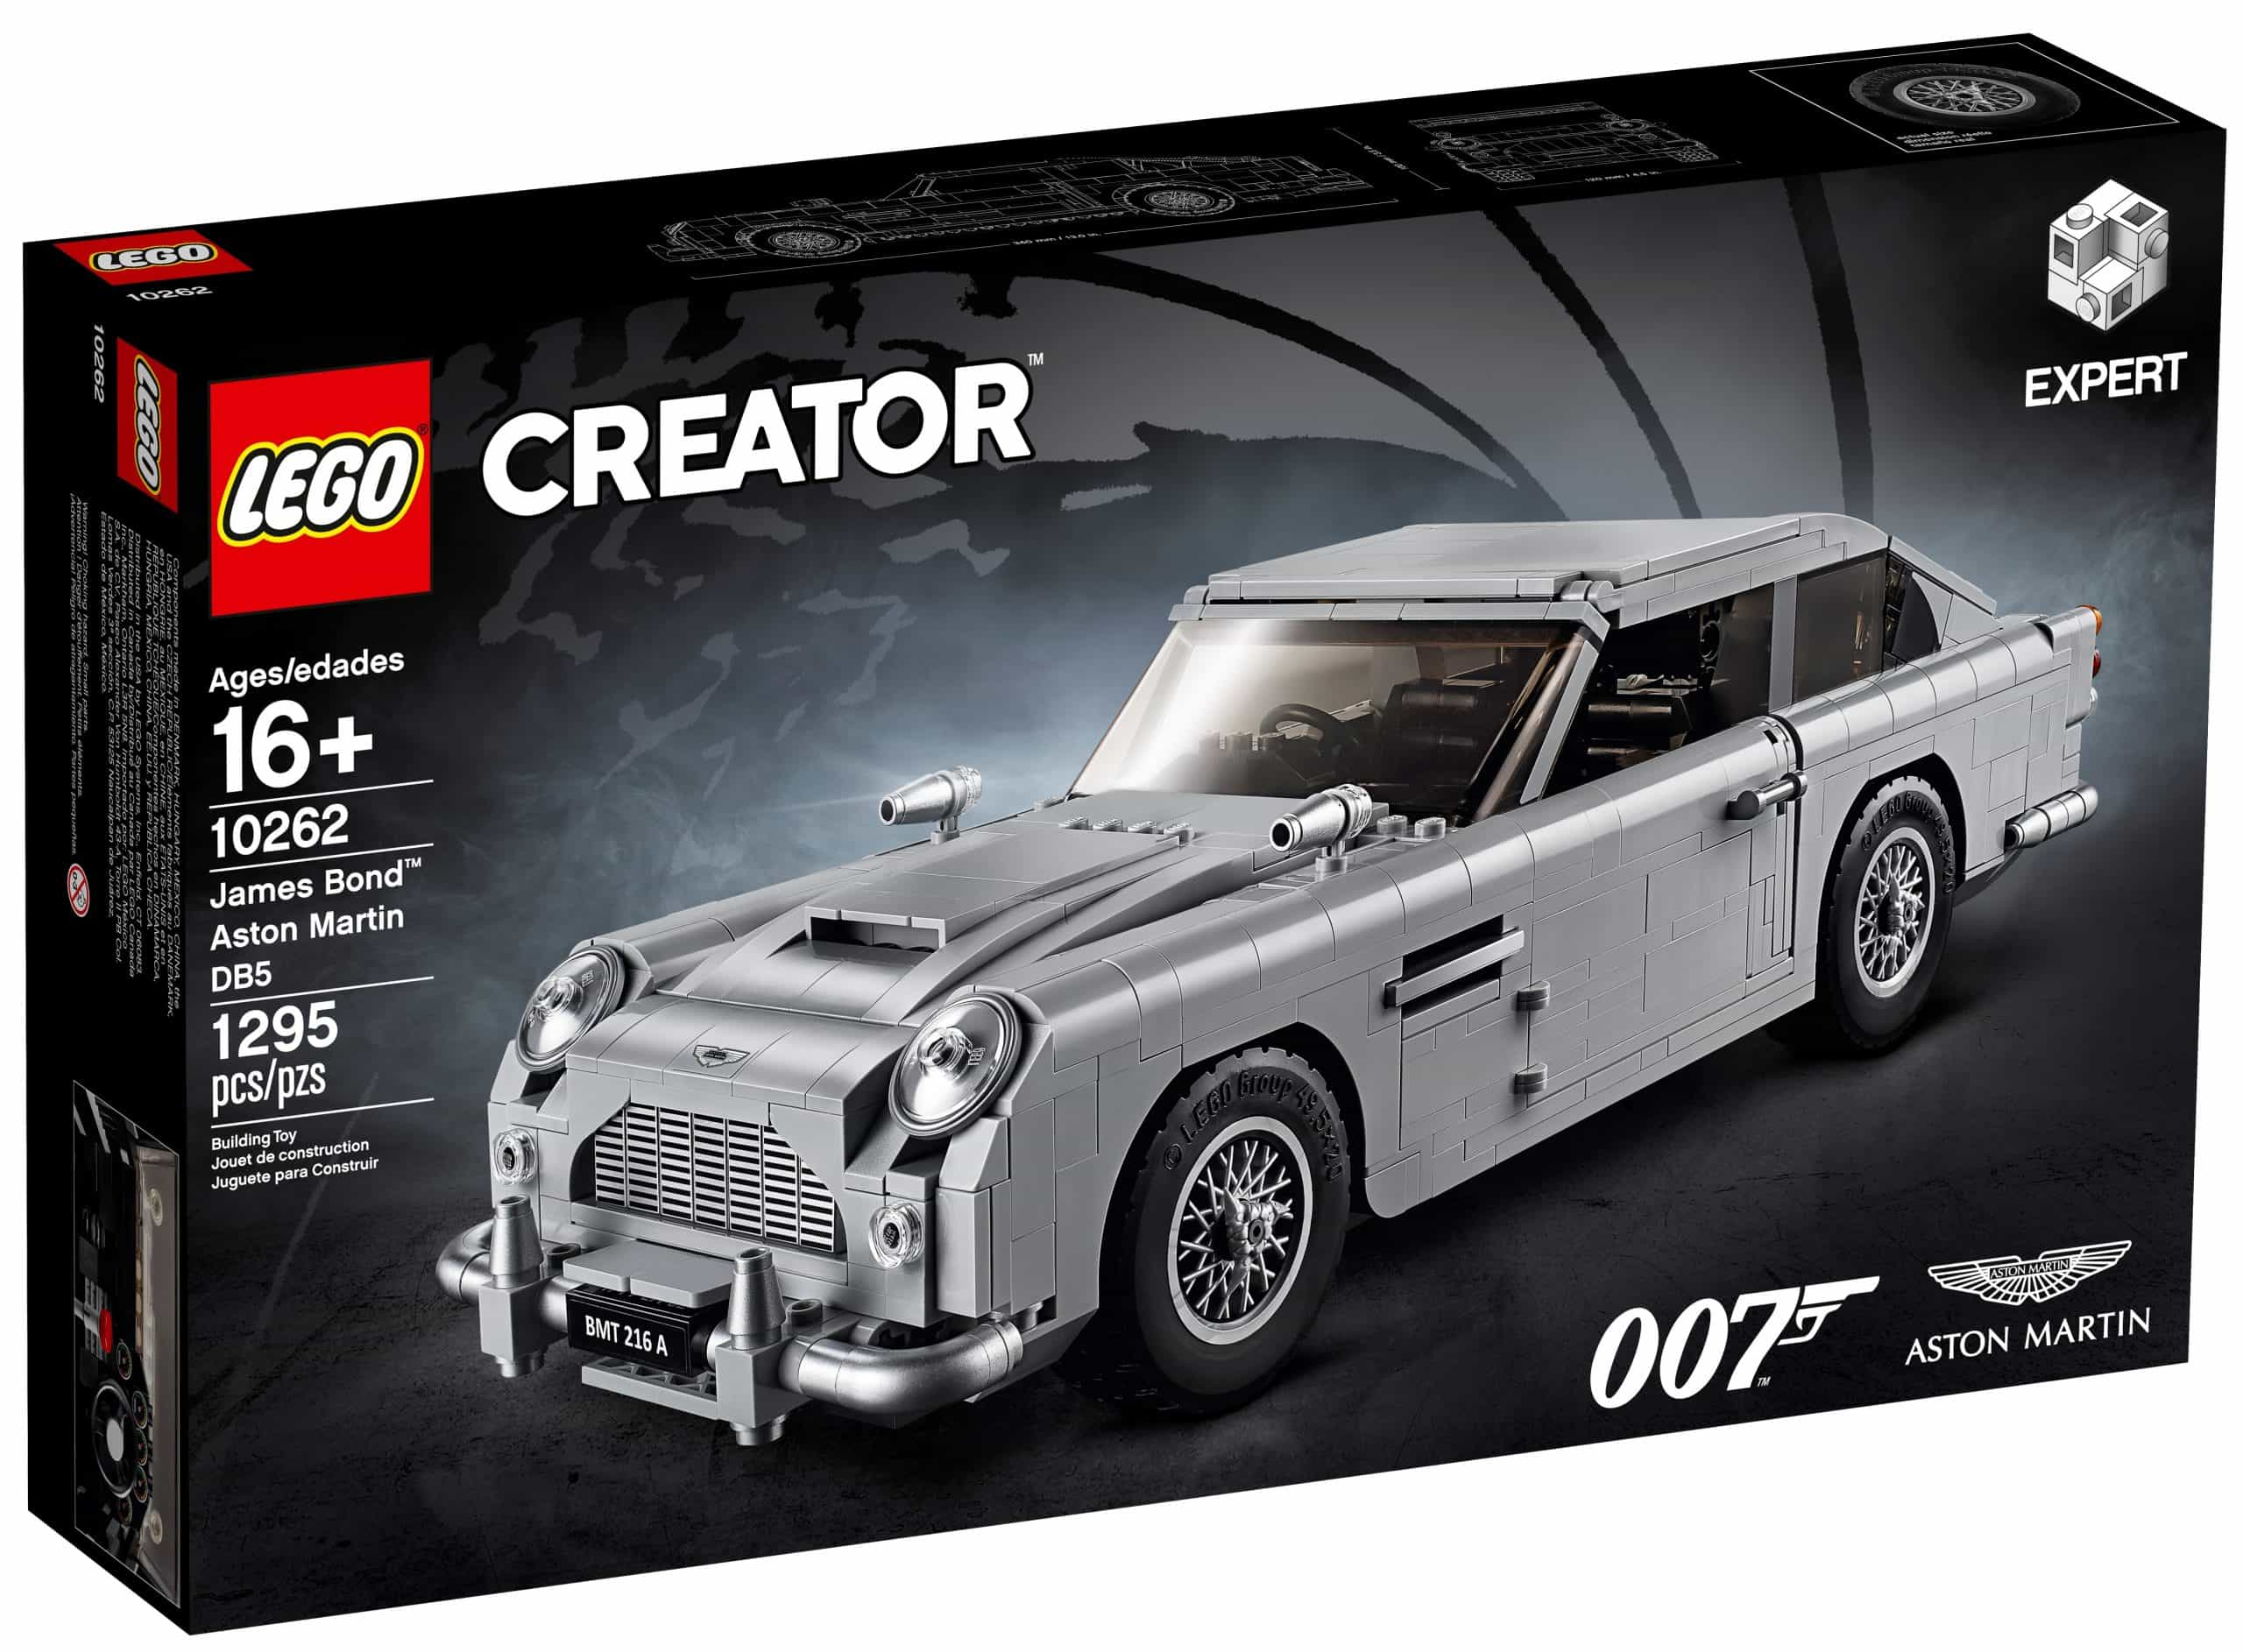 Lego 10262 Angebote James Bond Aston Martin Db5 121 27 Niedrigster Preis 19 Rabatt